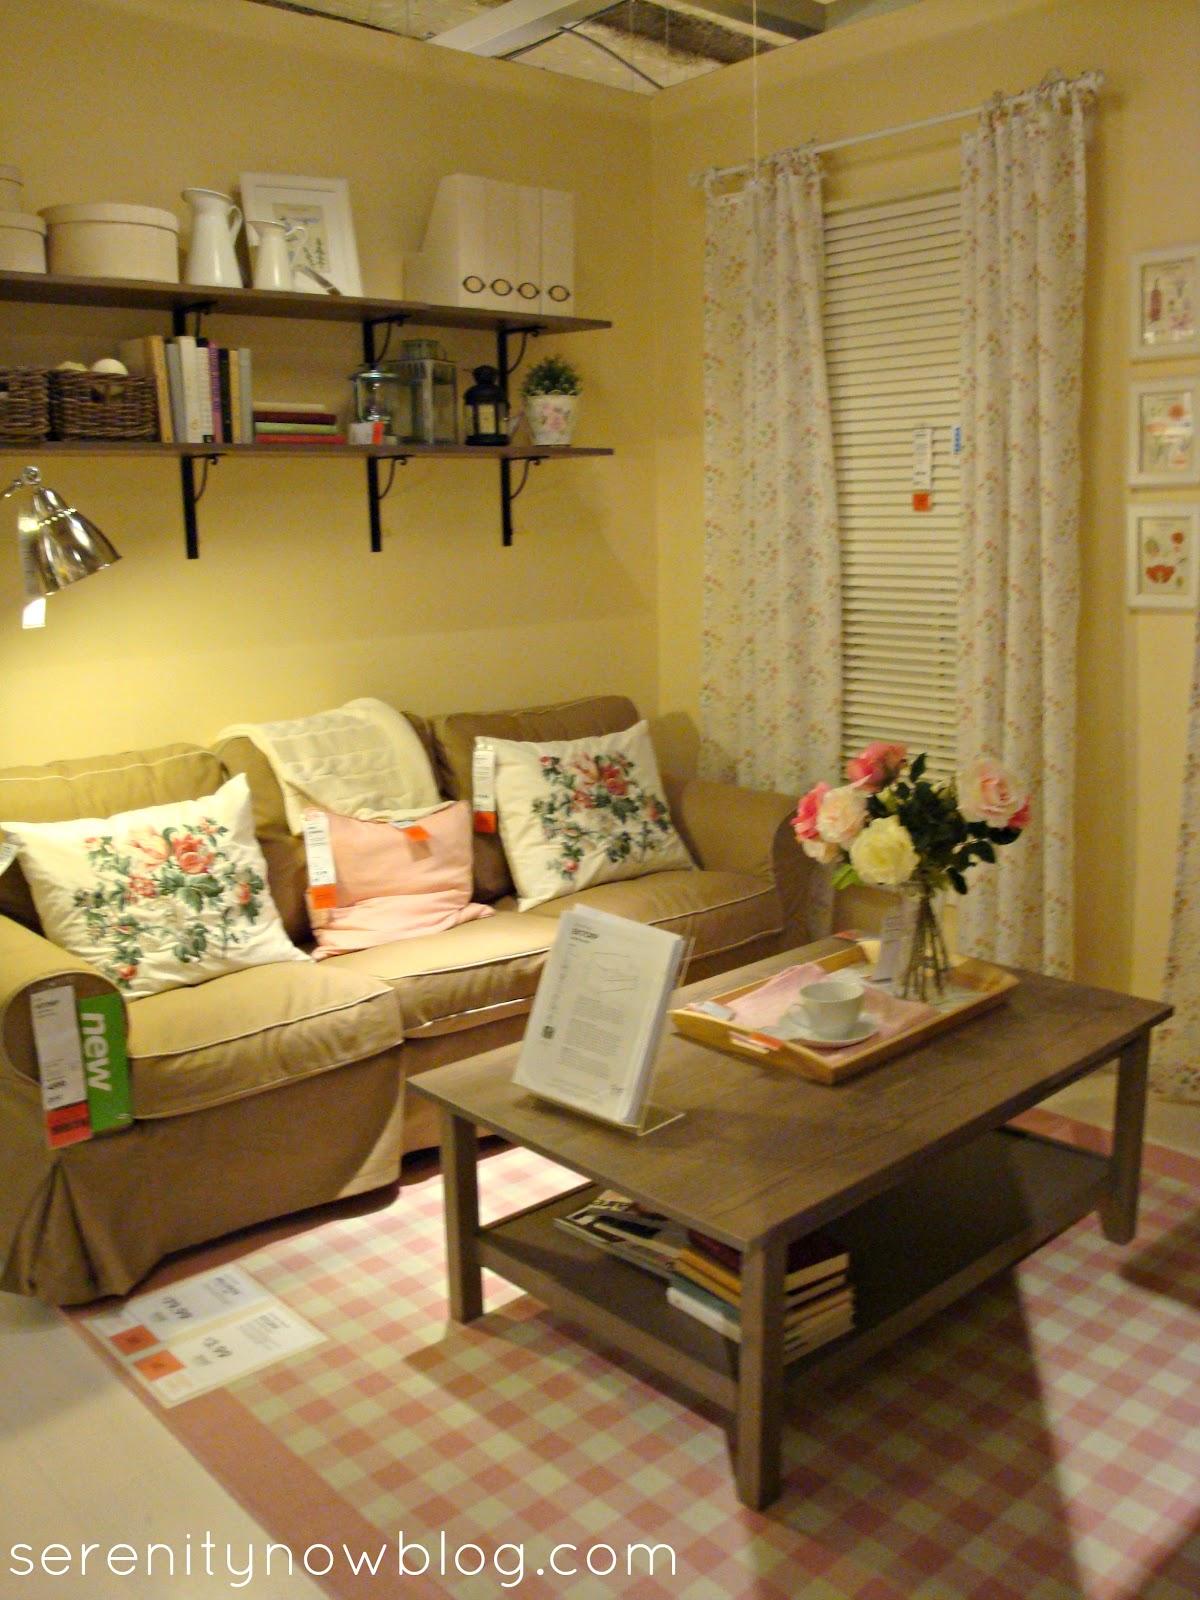 Marvelous Den Decorating Ideas Kitchen Layout And Decor Ideas Largest Home Design Picture Inspirations Pitcheantrous